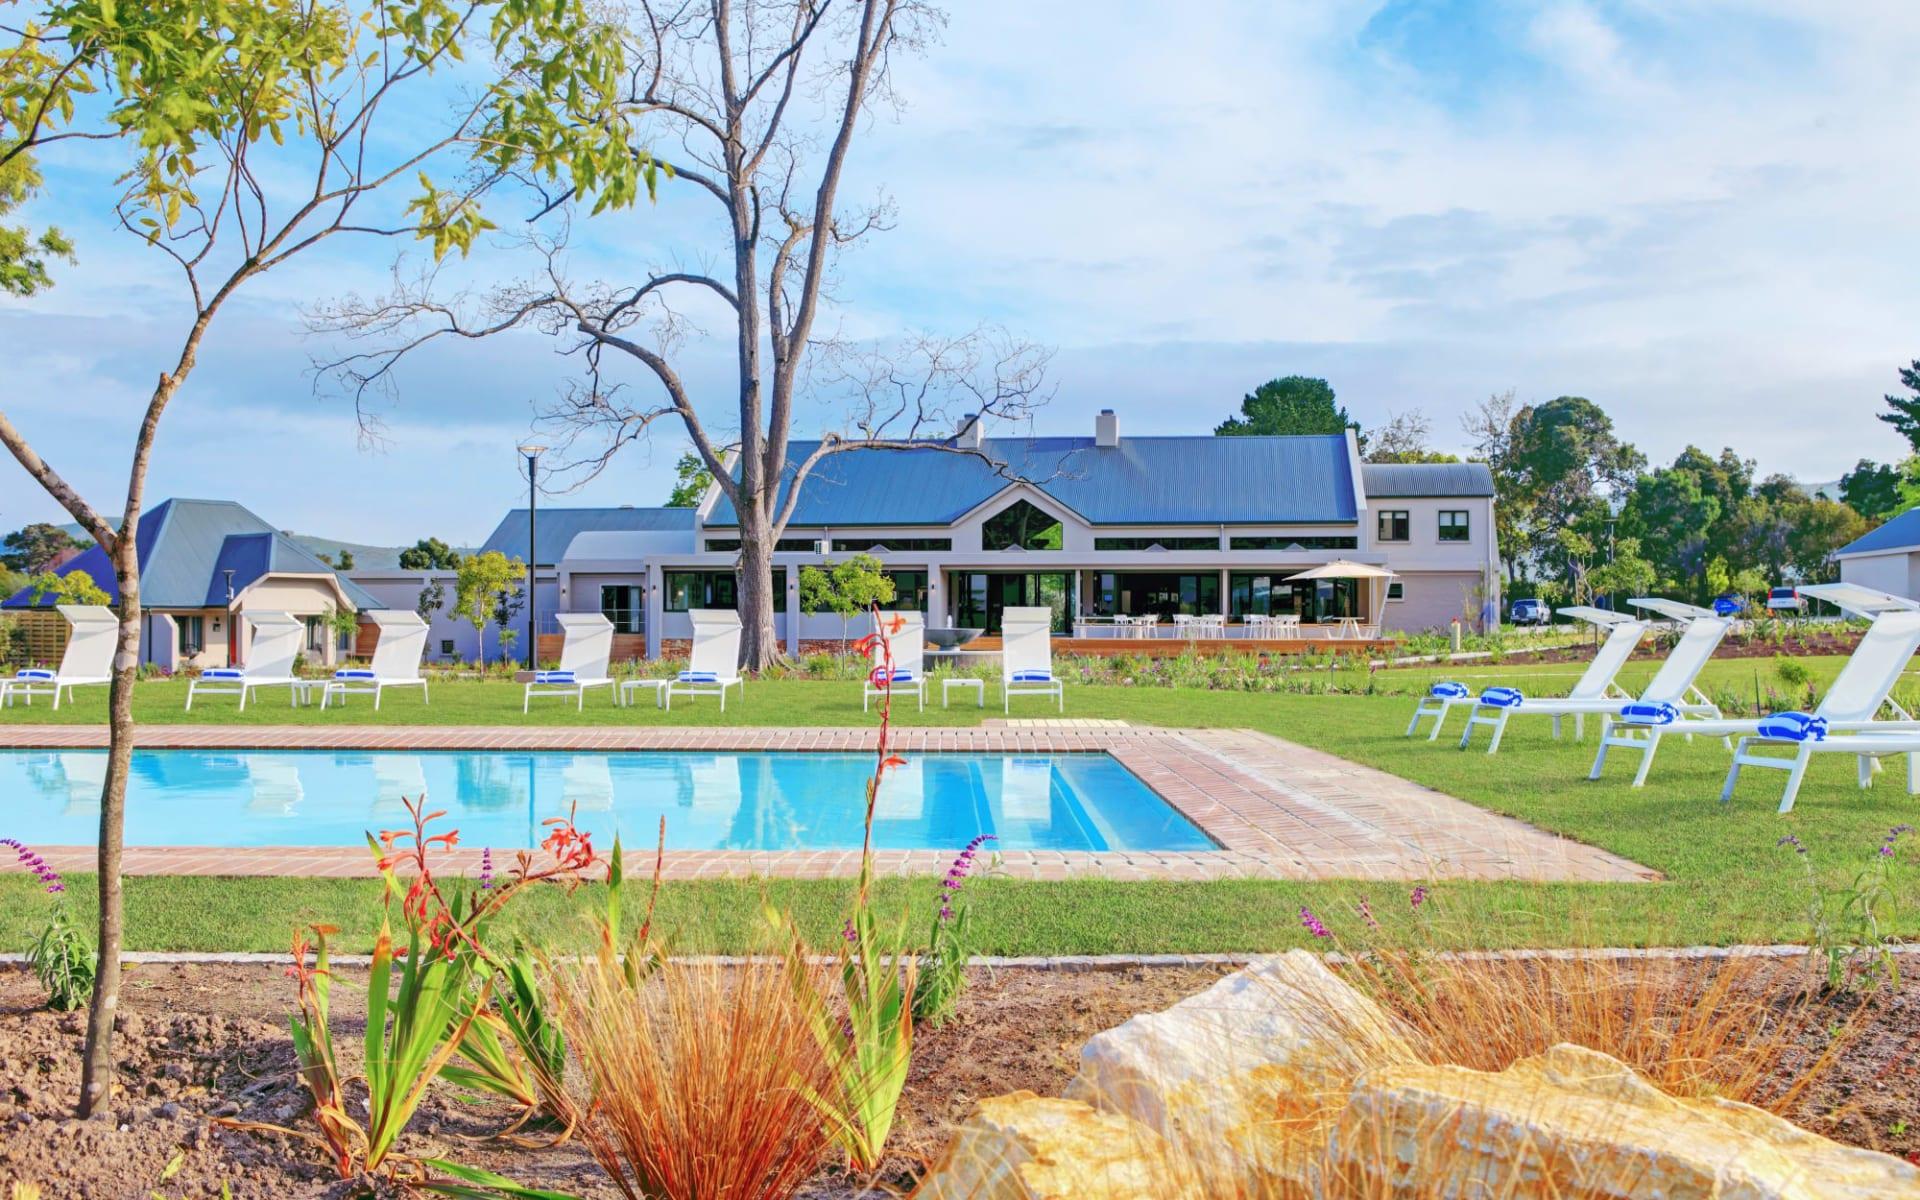 Knysna Hollow Country Estate: facilities Knysna Hollow - Swimmingpool